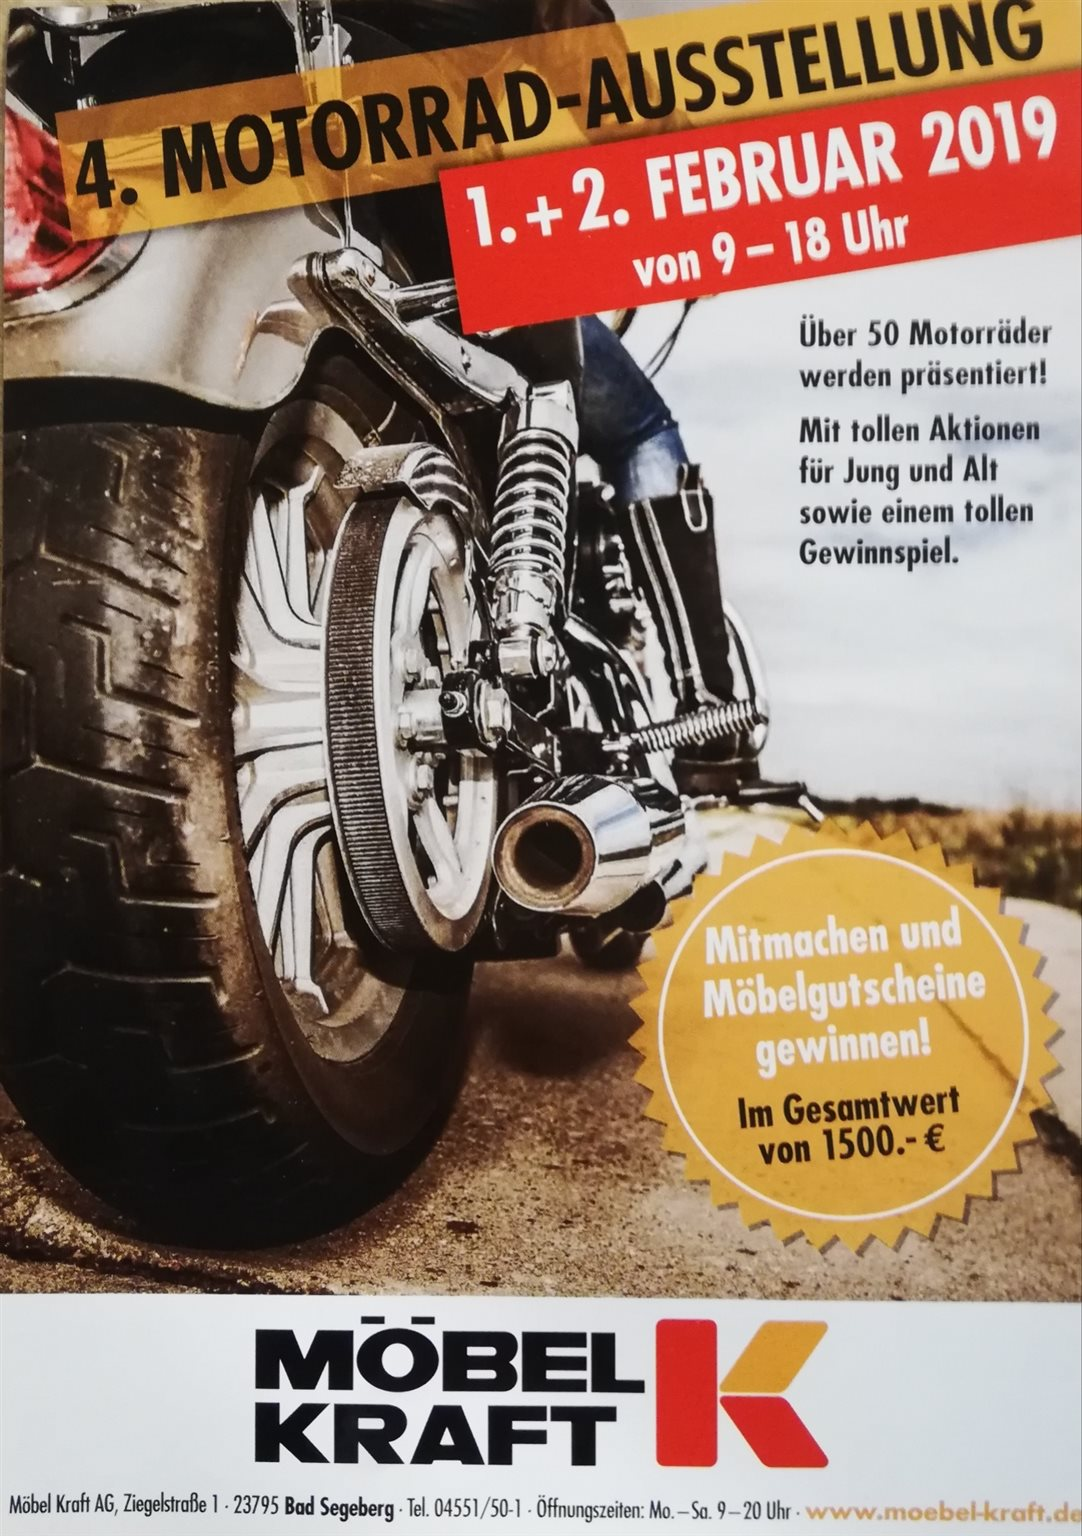 4 Motorrad Ausstellung Möbel Kraft